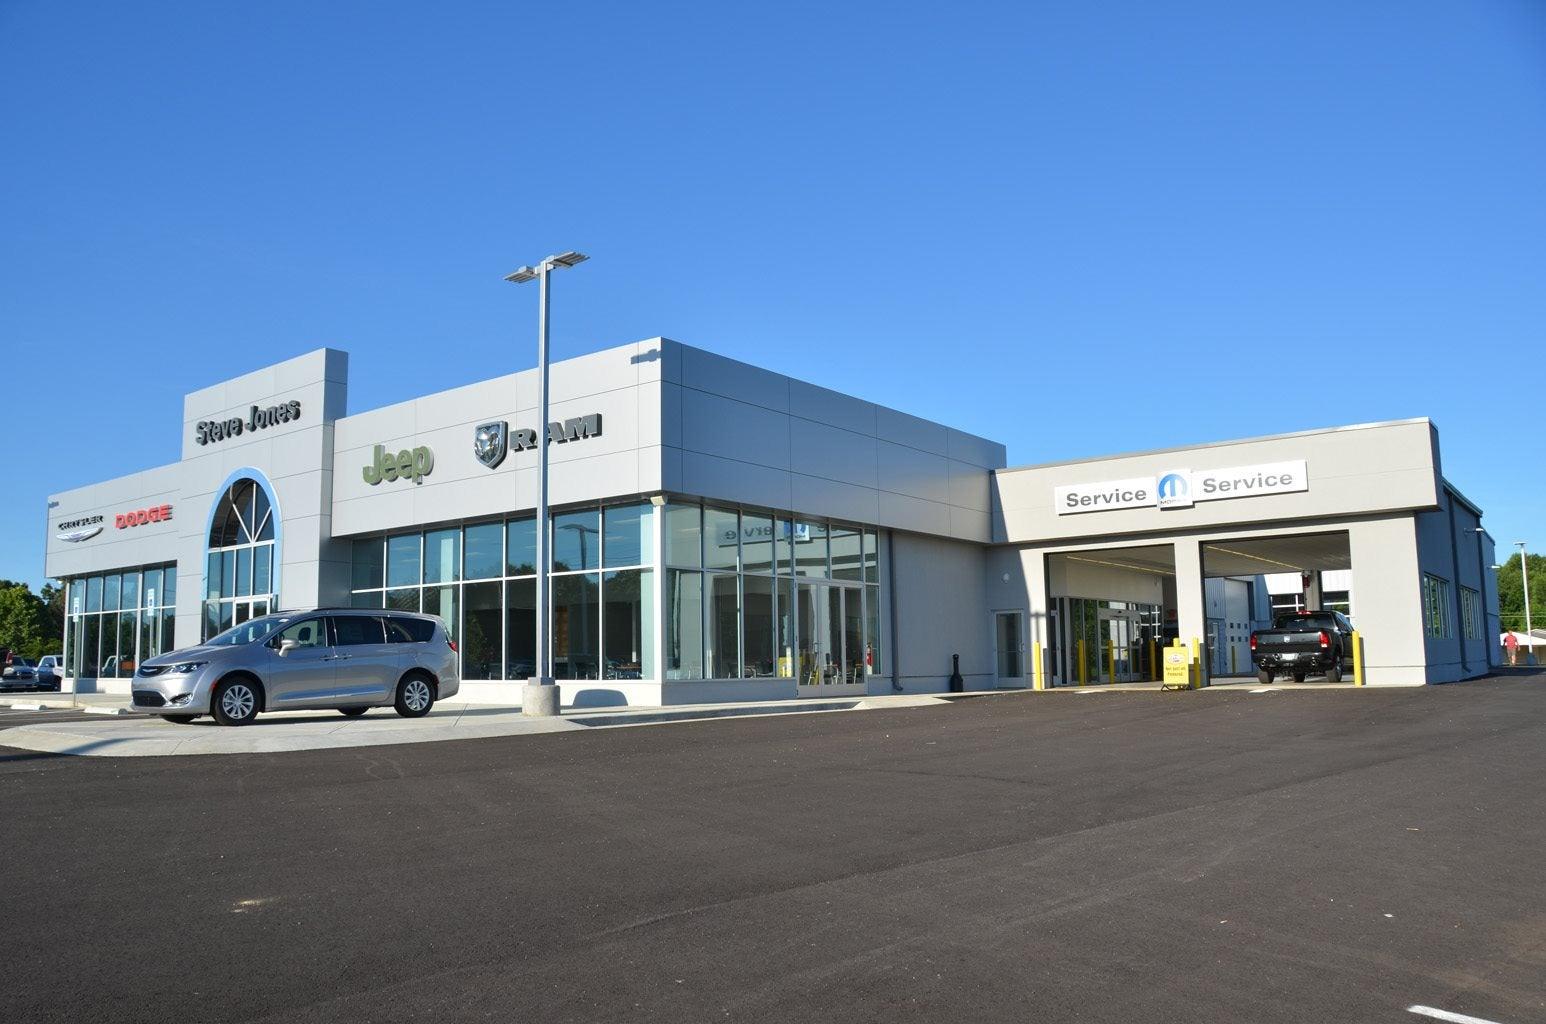 dodge dealership dickson tn About Steve Jones CDJR  Dickson, TN & Franklin, TN